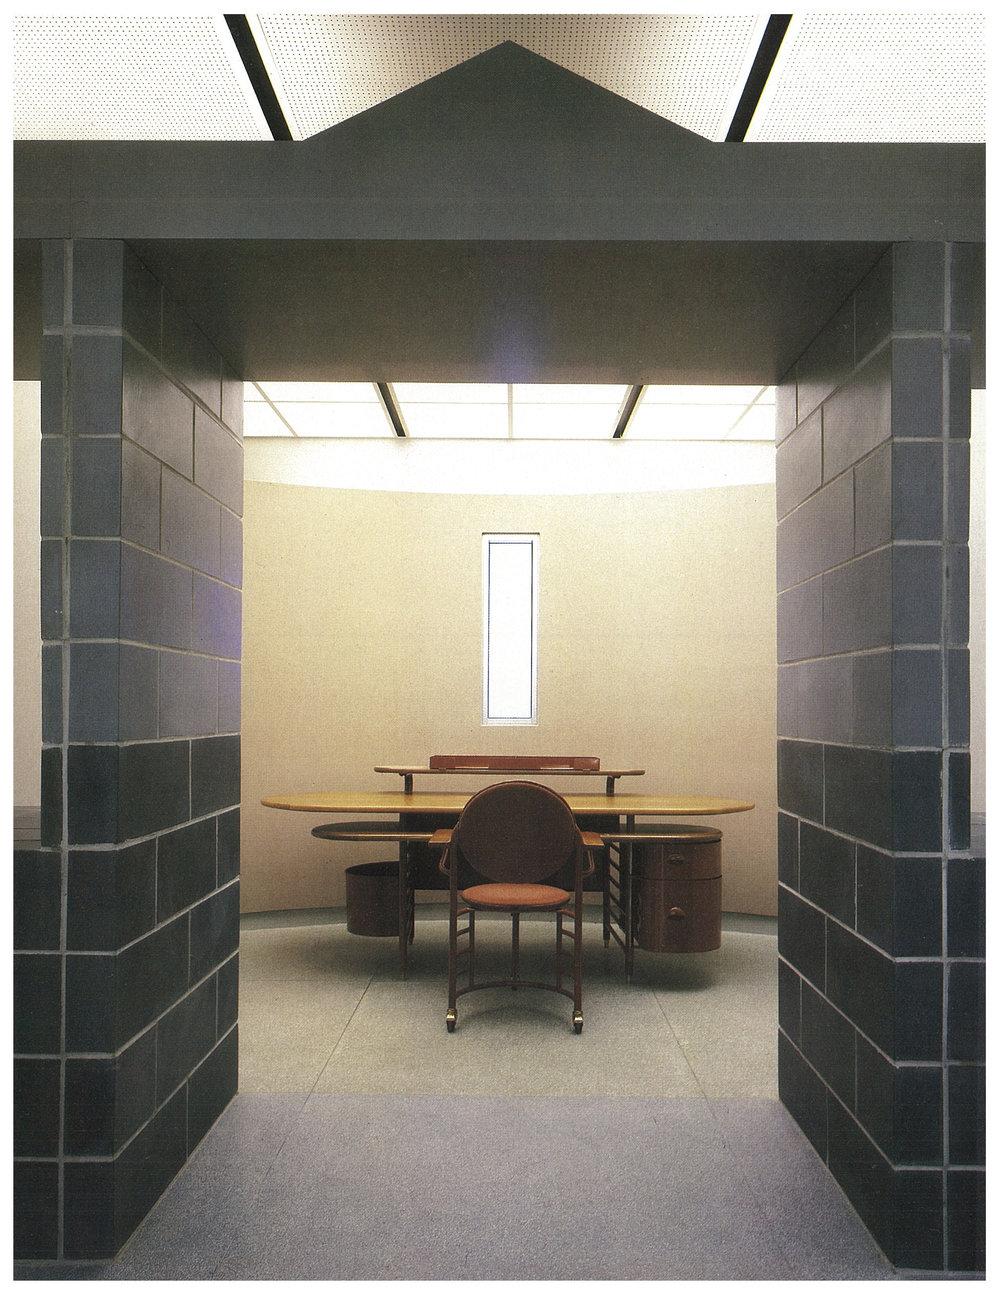 Steelcase Showroom-Photo FLW Desk Entry copy.jpg